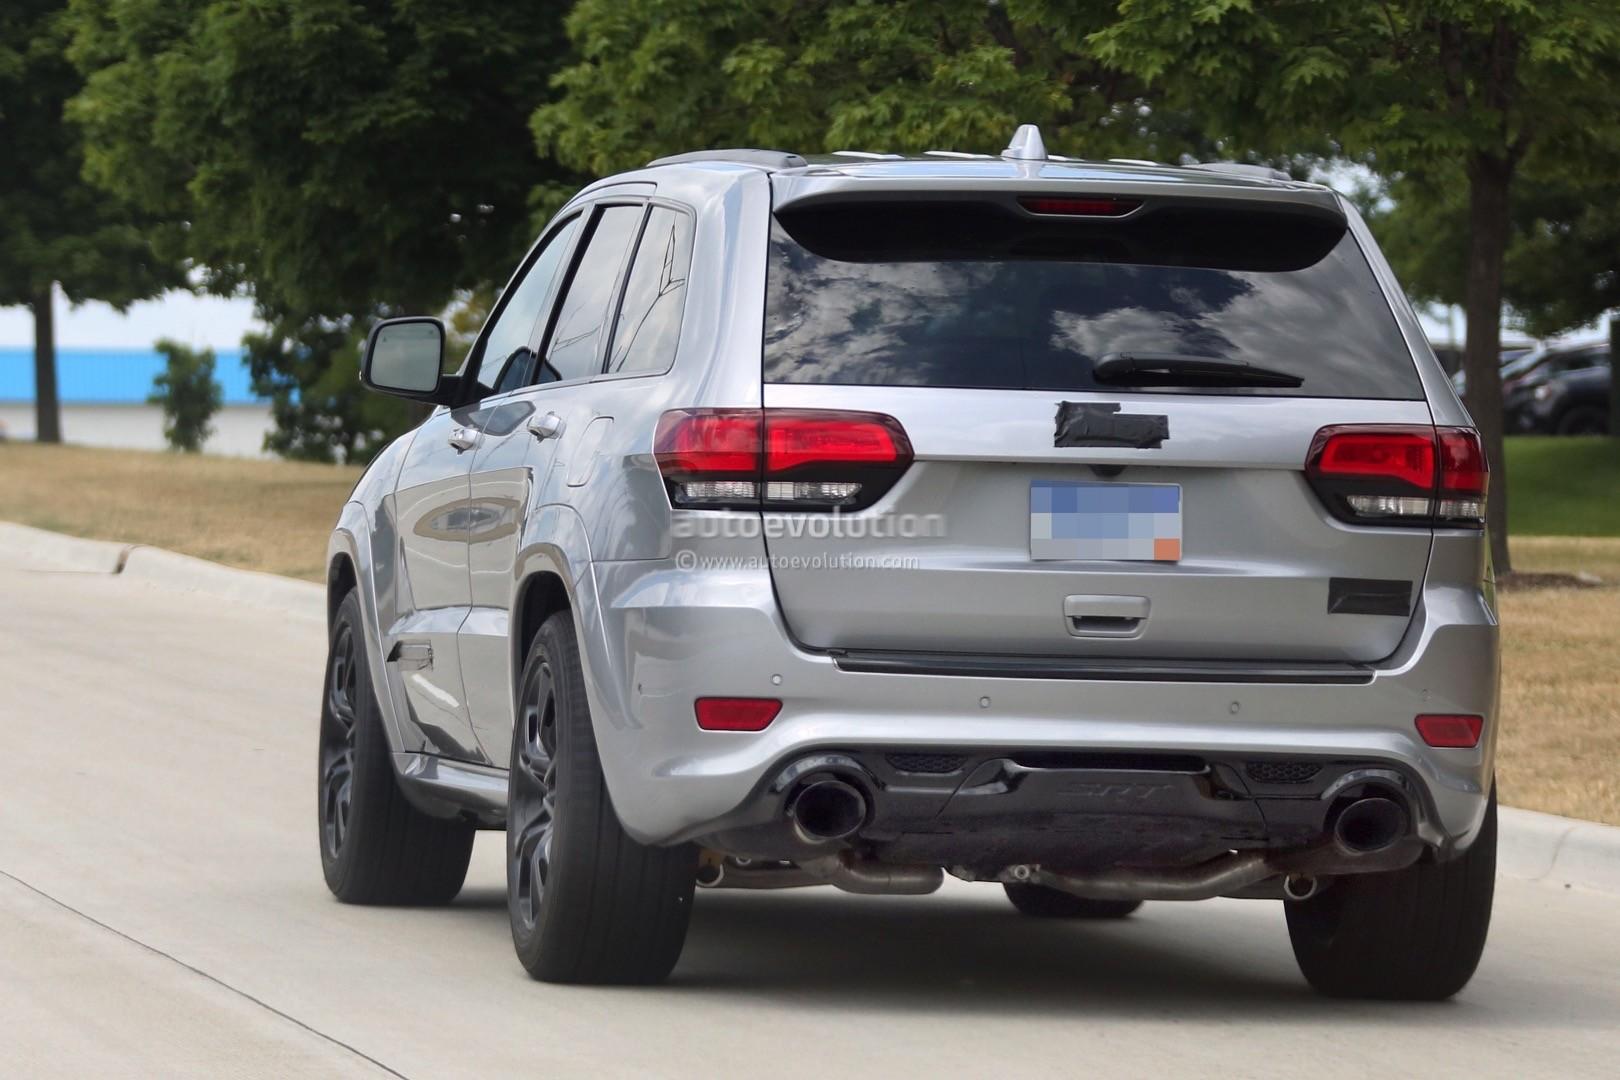 Jeep Trackhawk 2018 >> 2018 Jeep Grand Cherokee Trackhawk Confirmed For New York Debut - autoevolution